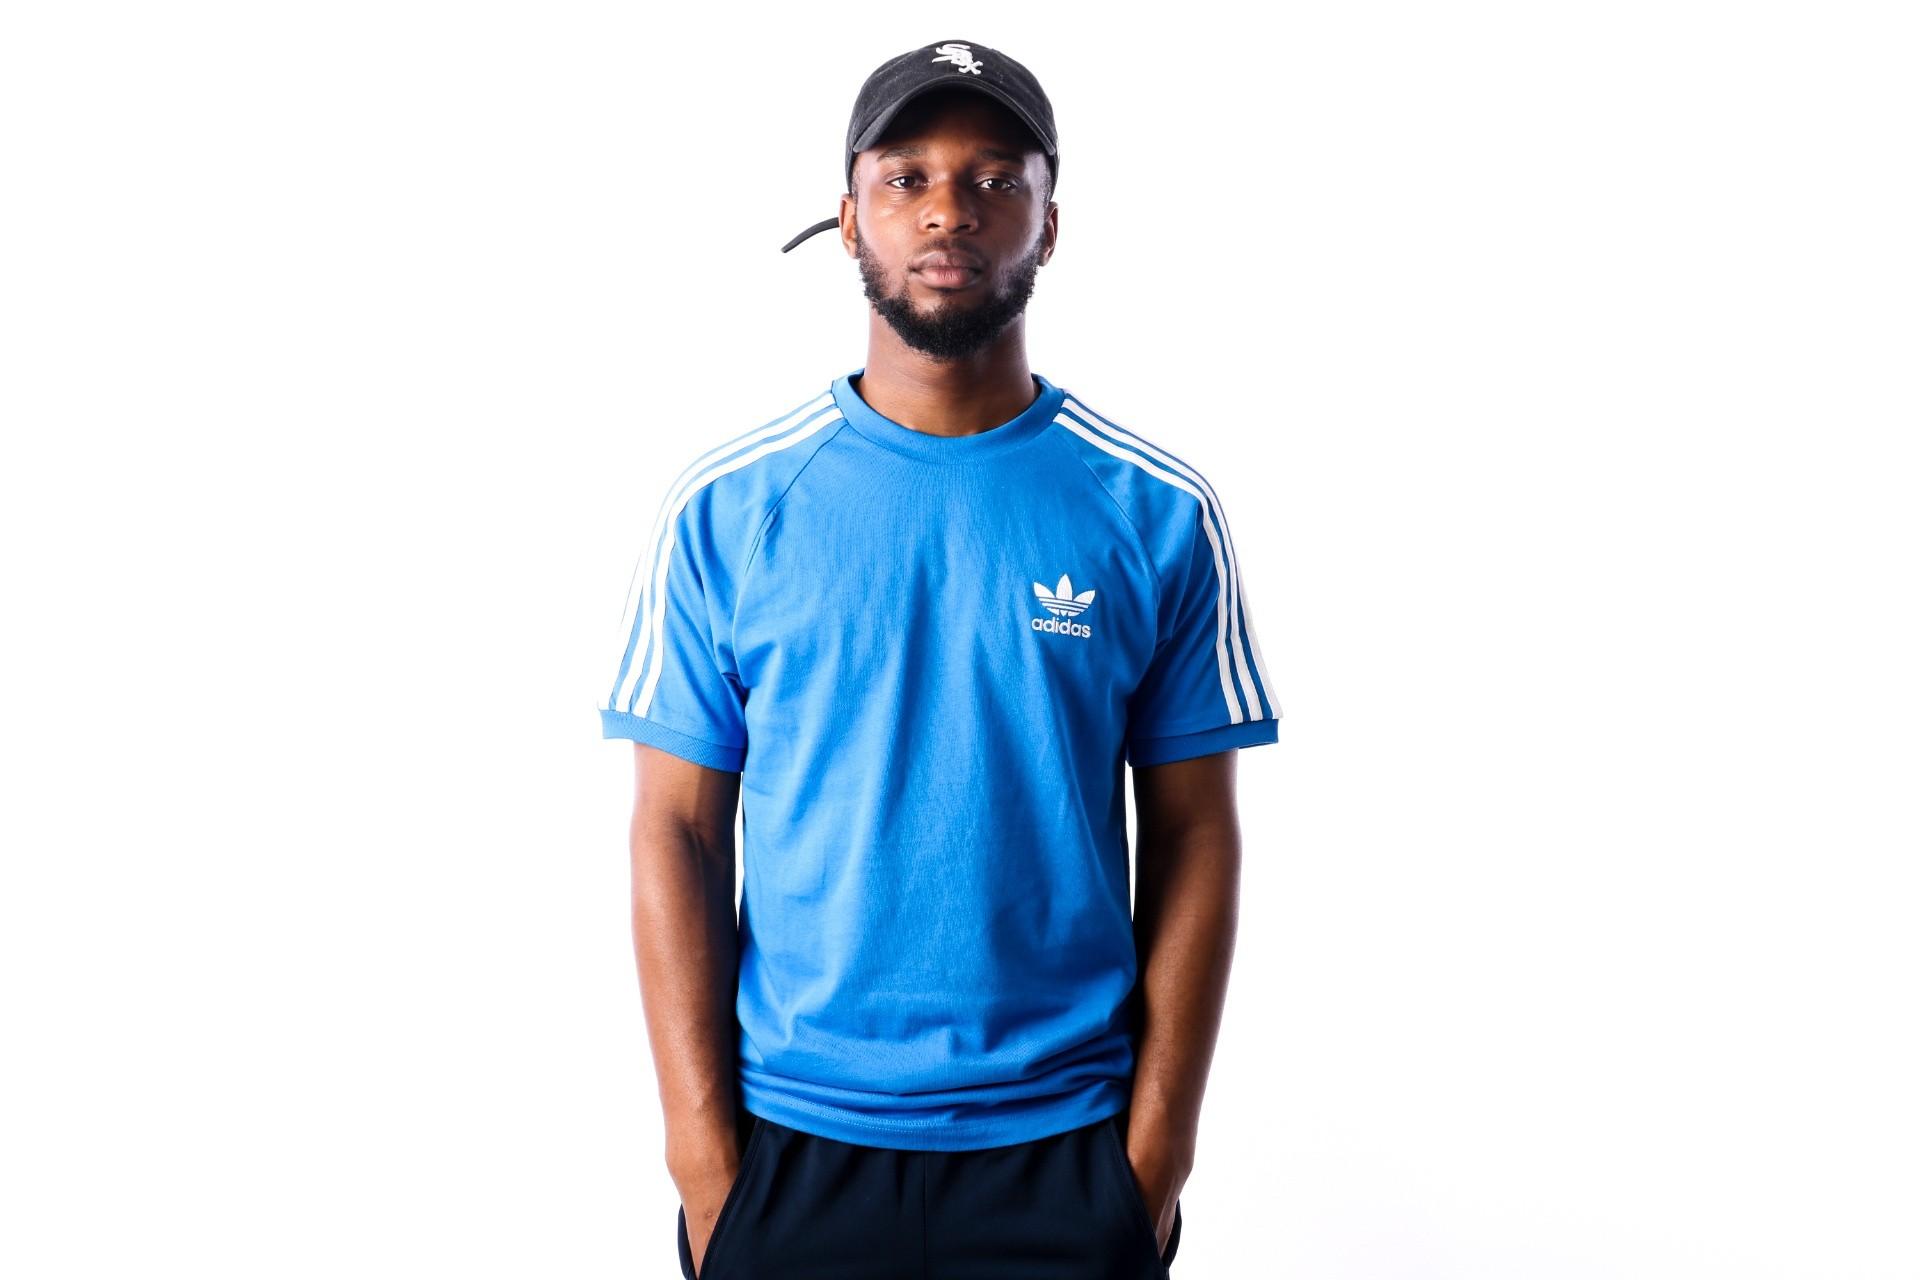 Afbeelding van Adidas 3-STRIPES TEE DH5805 t-shirt BLUEBIRD